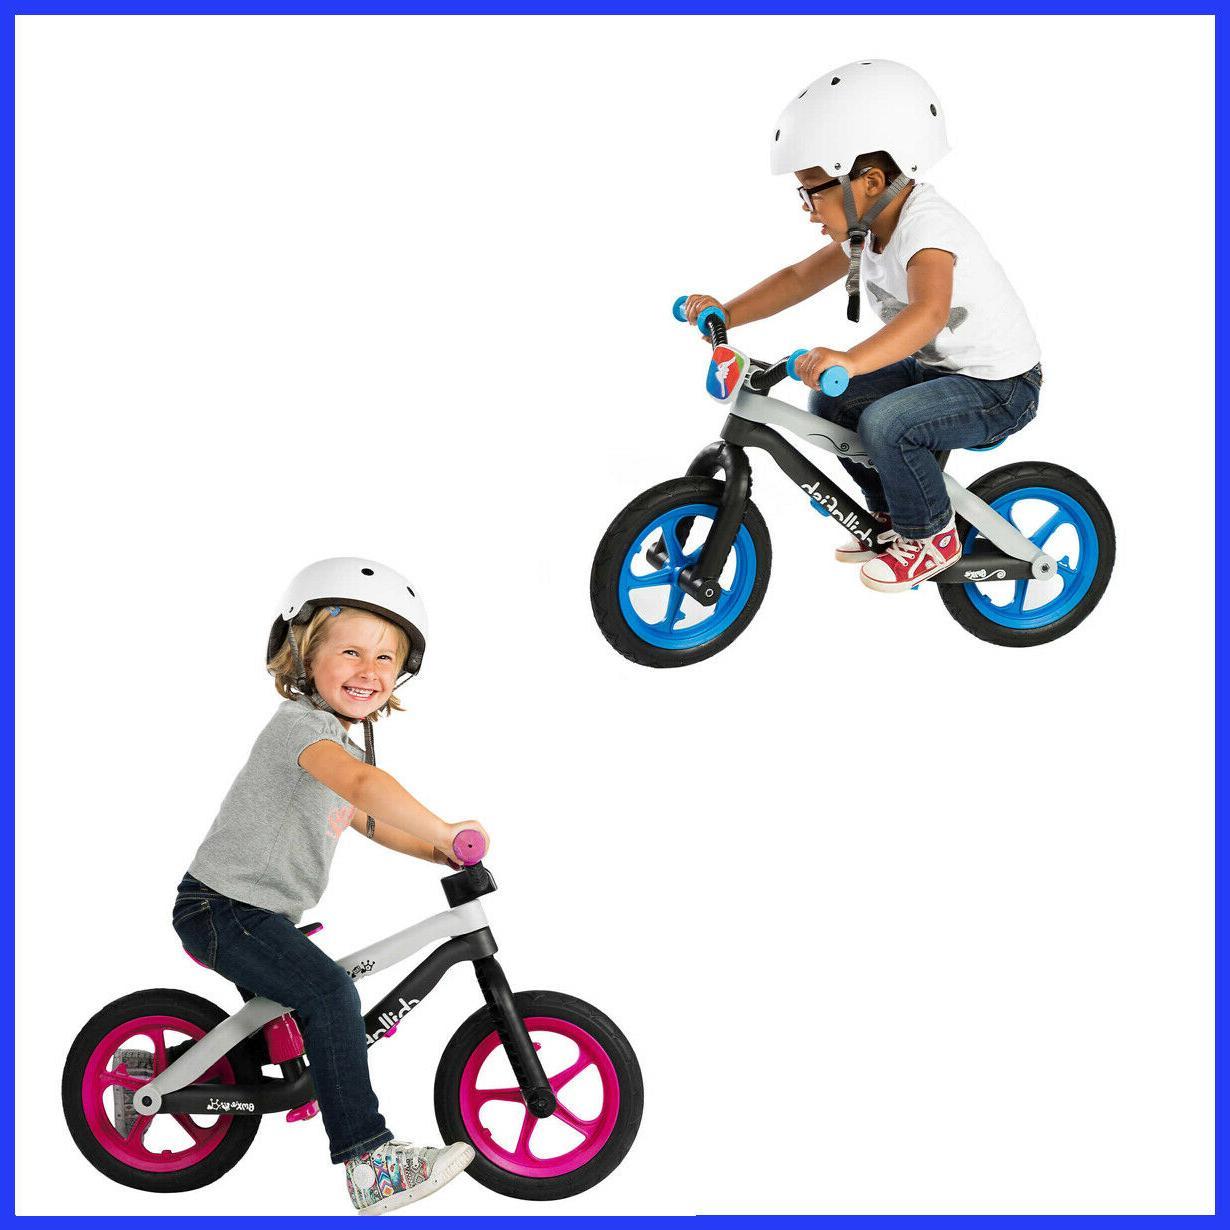 Chillafish BMXie Balance Bike Seat Adjustable No Tax